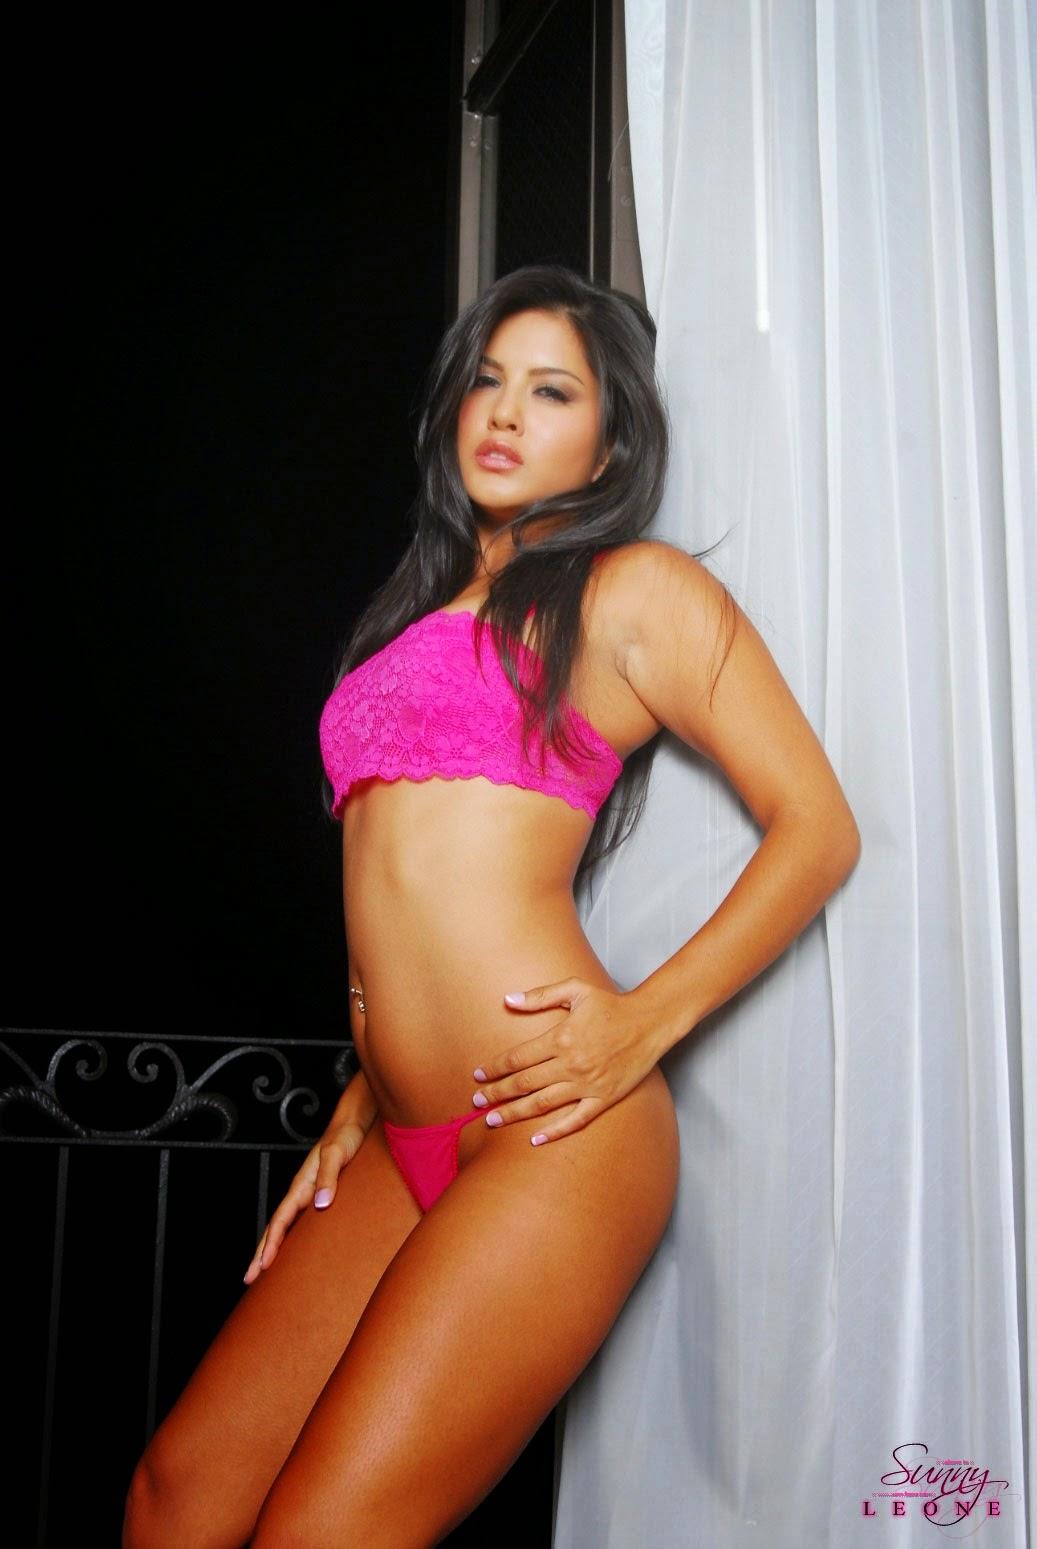 Sunny Leone Gorgeous Pink Bra - Sunny Leone - The Sex Goddess-5073